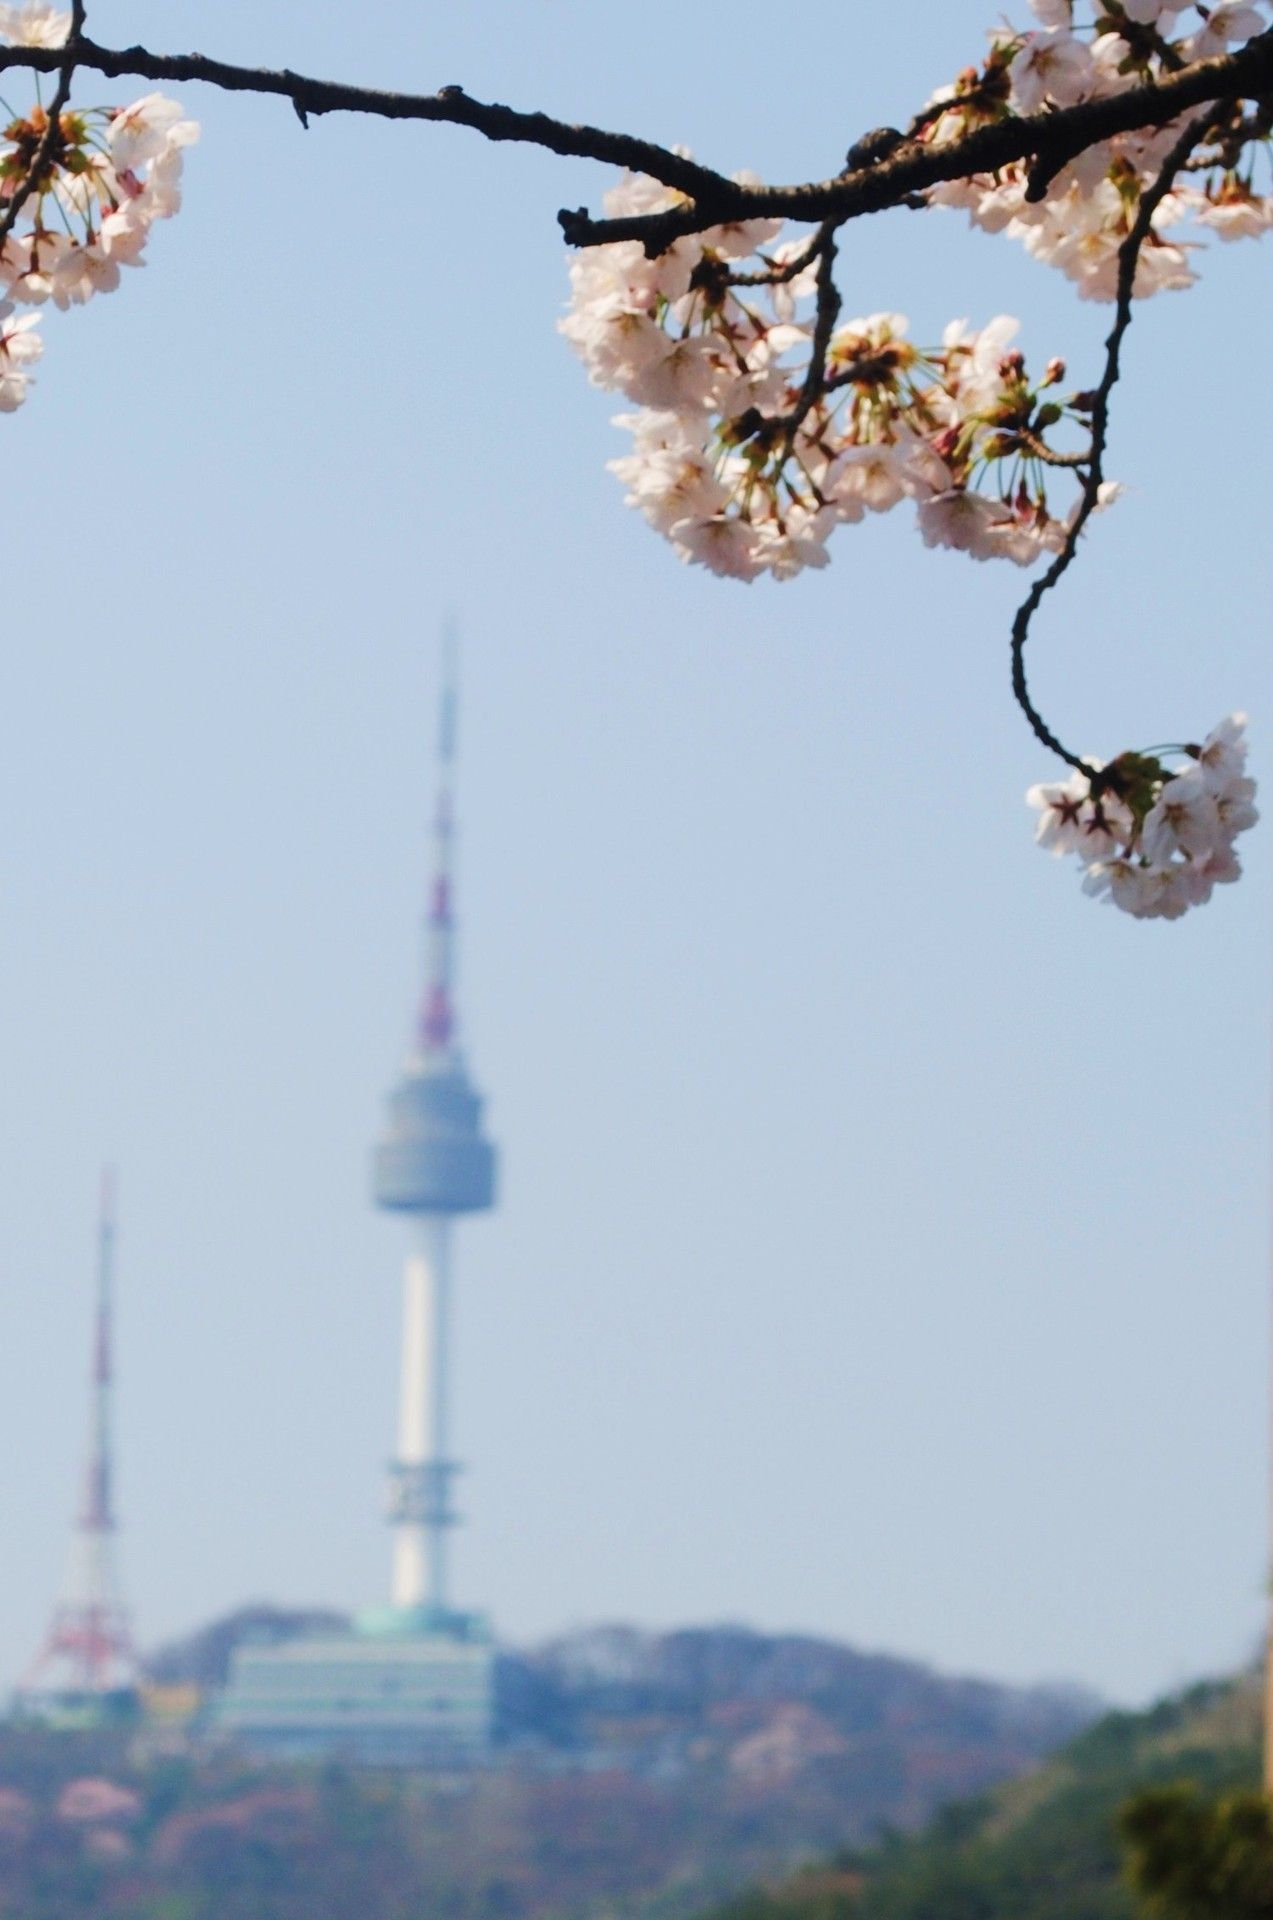 Seoul Tower During Cherry Blossom Season Seoul South Korea Korea Wallpaper South Korea Seoul South Korea Photography